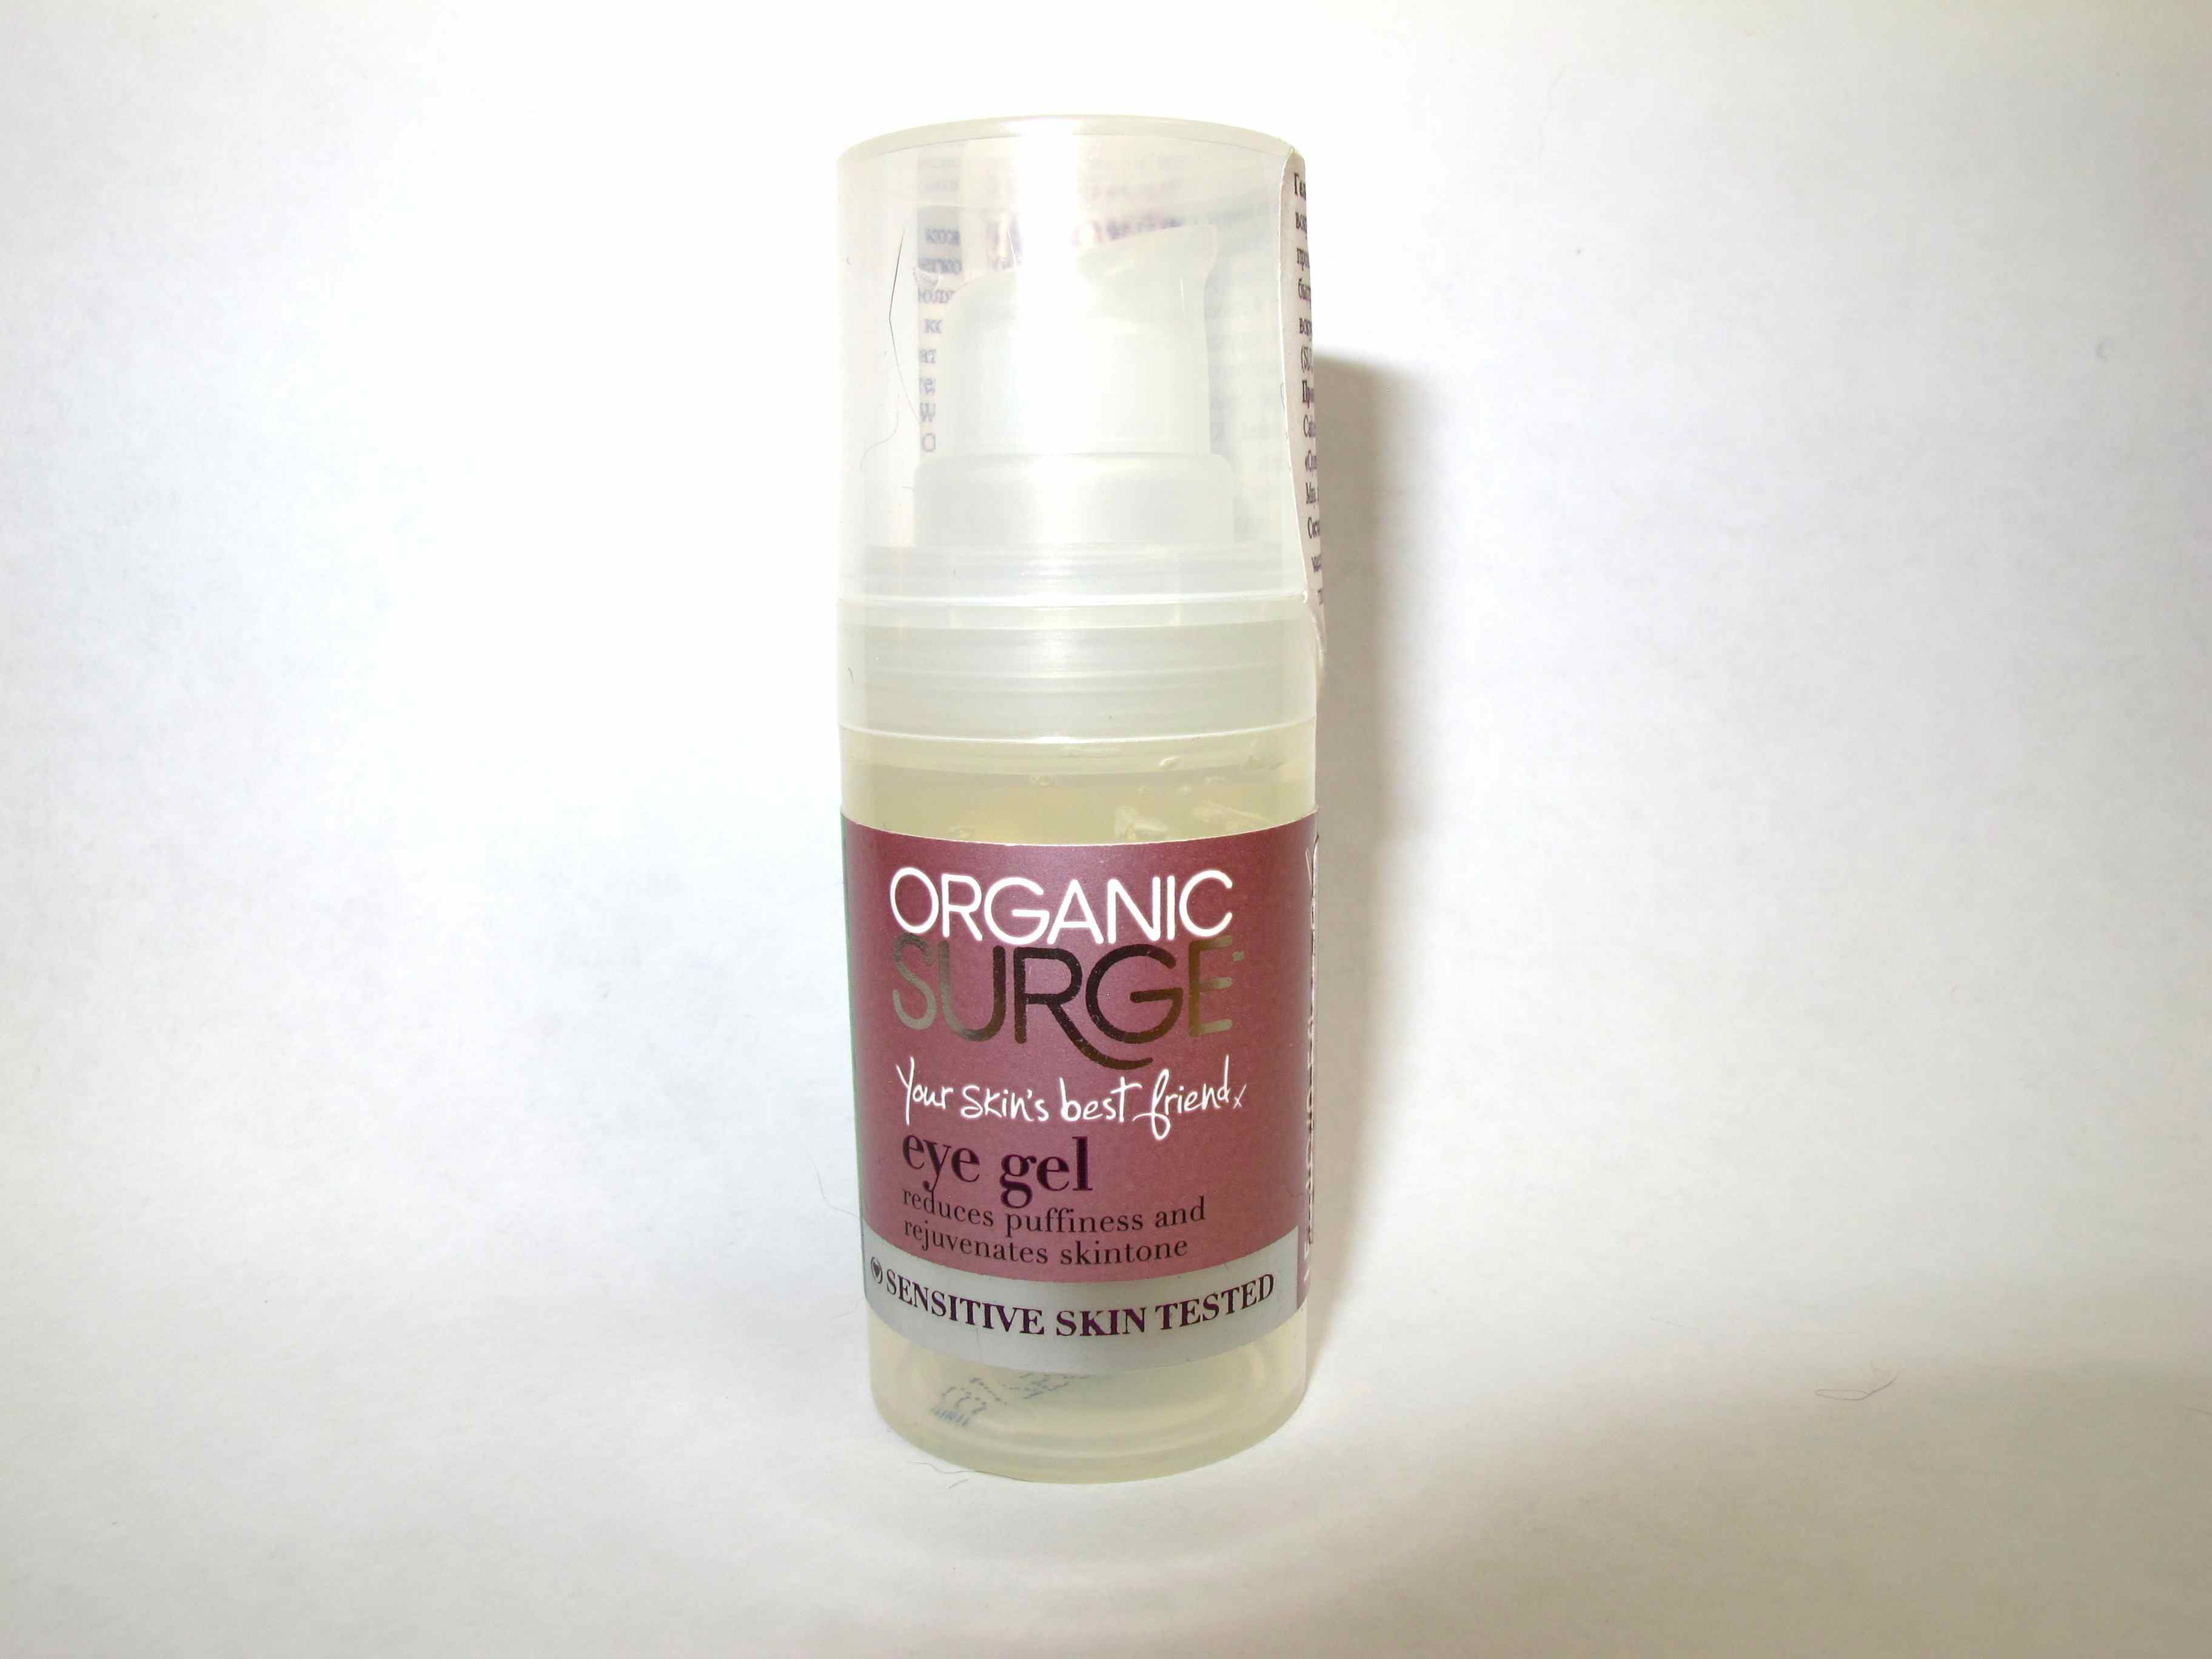 Organic Surge room